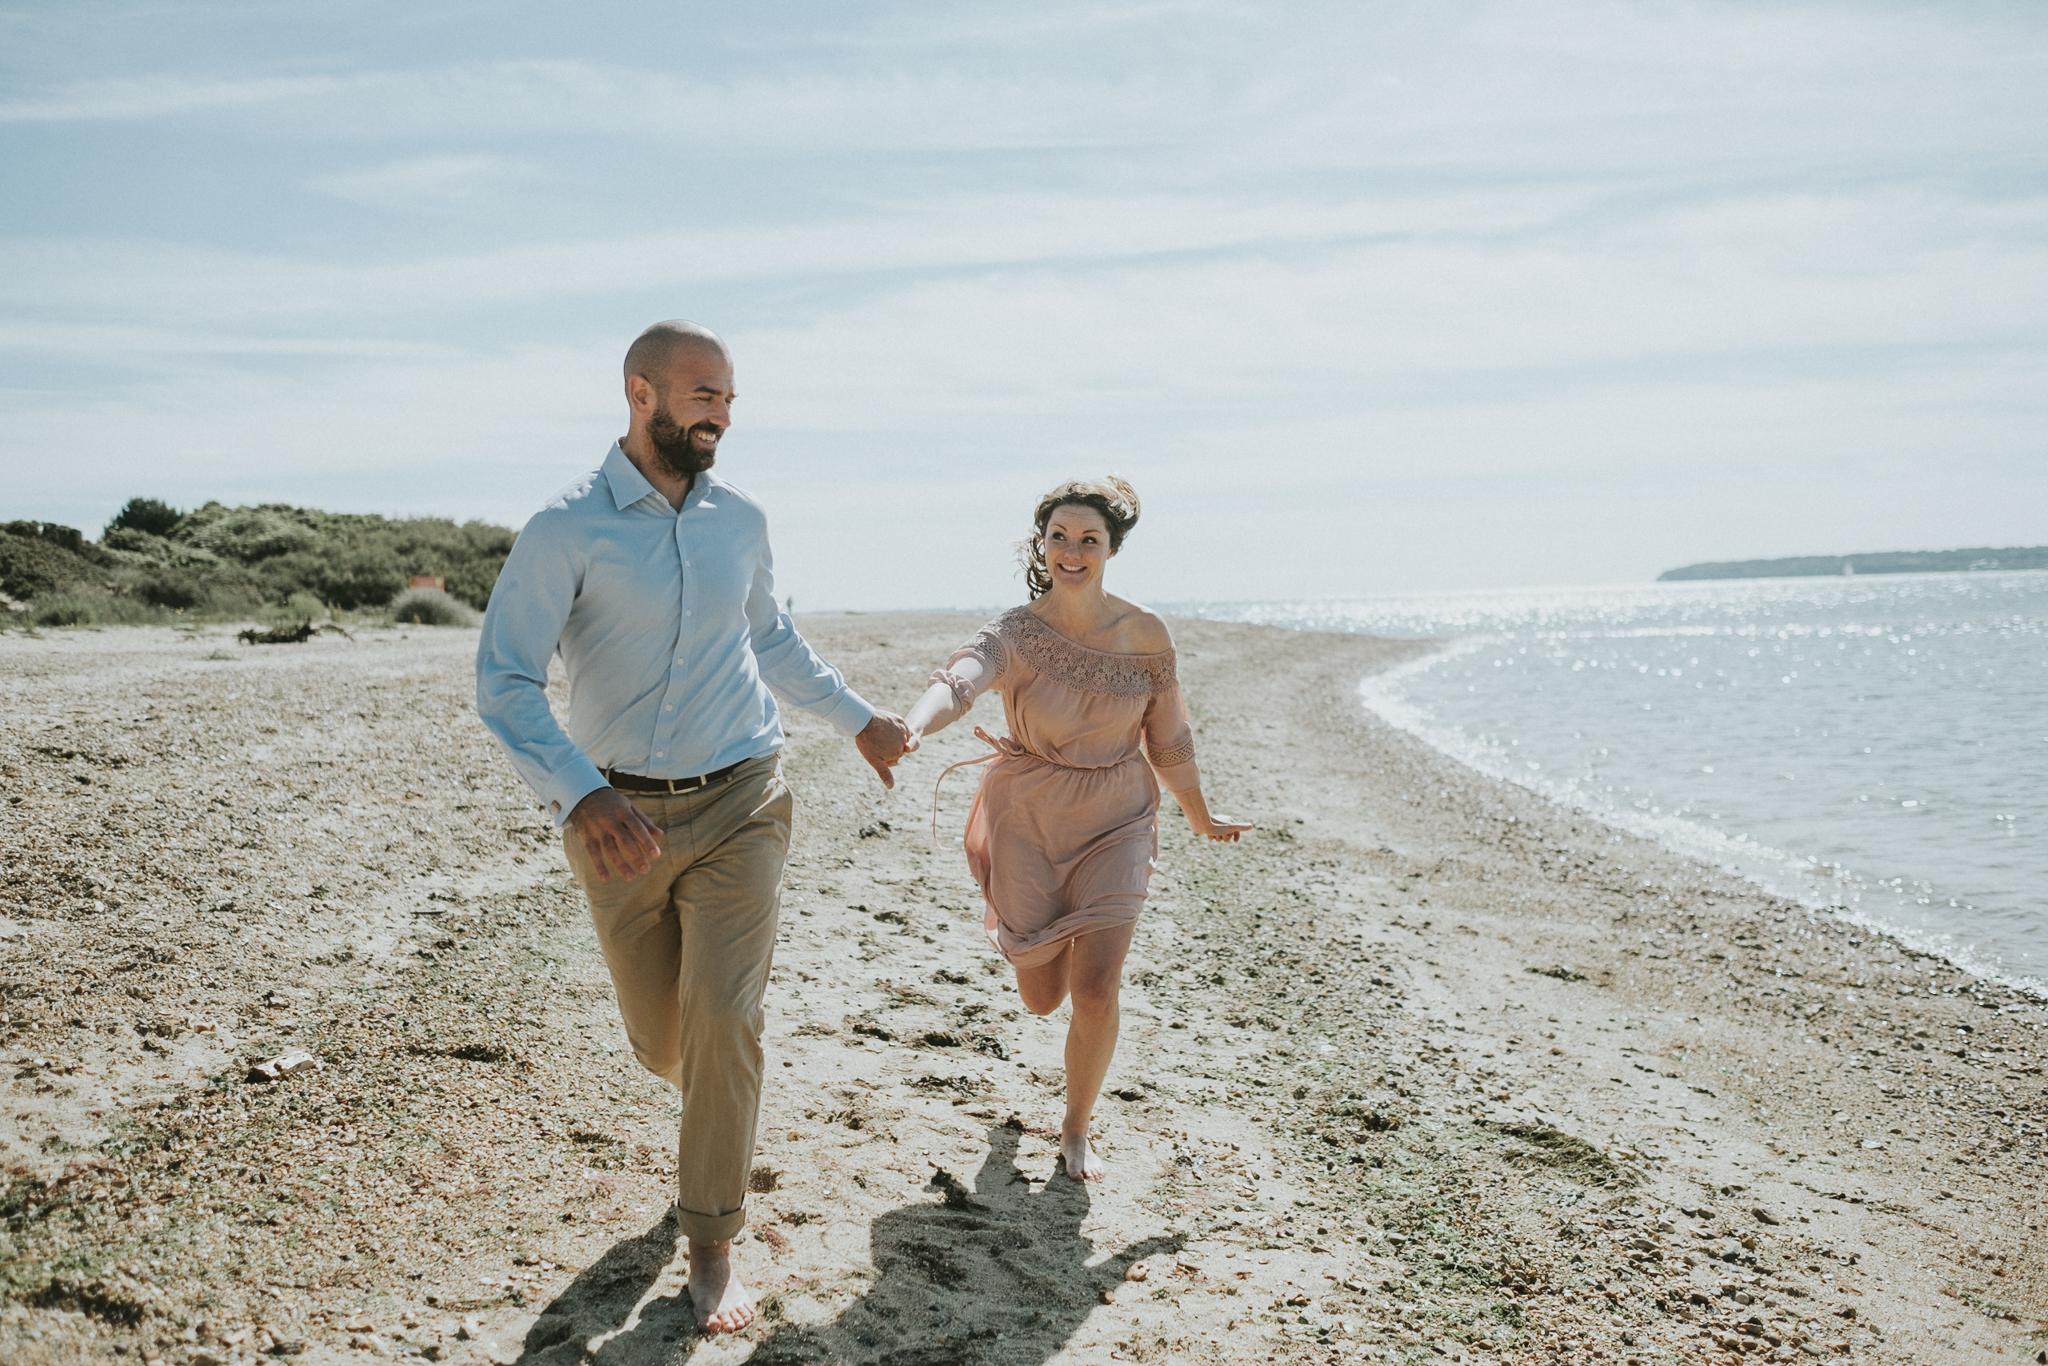 CRAIG-NICHOLAS-BERKSHIRE-WEDDING-PHOTOGRAHY (16 of 26).jpg